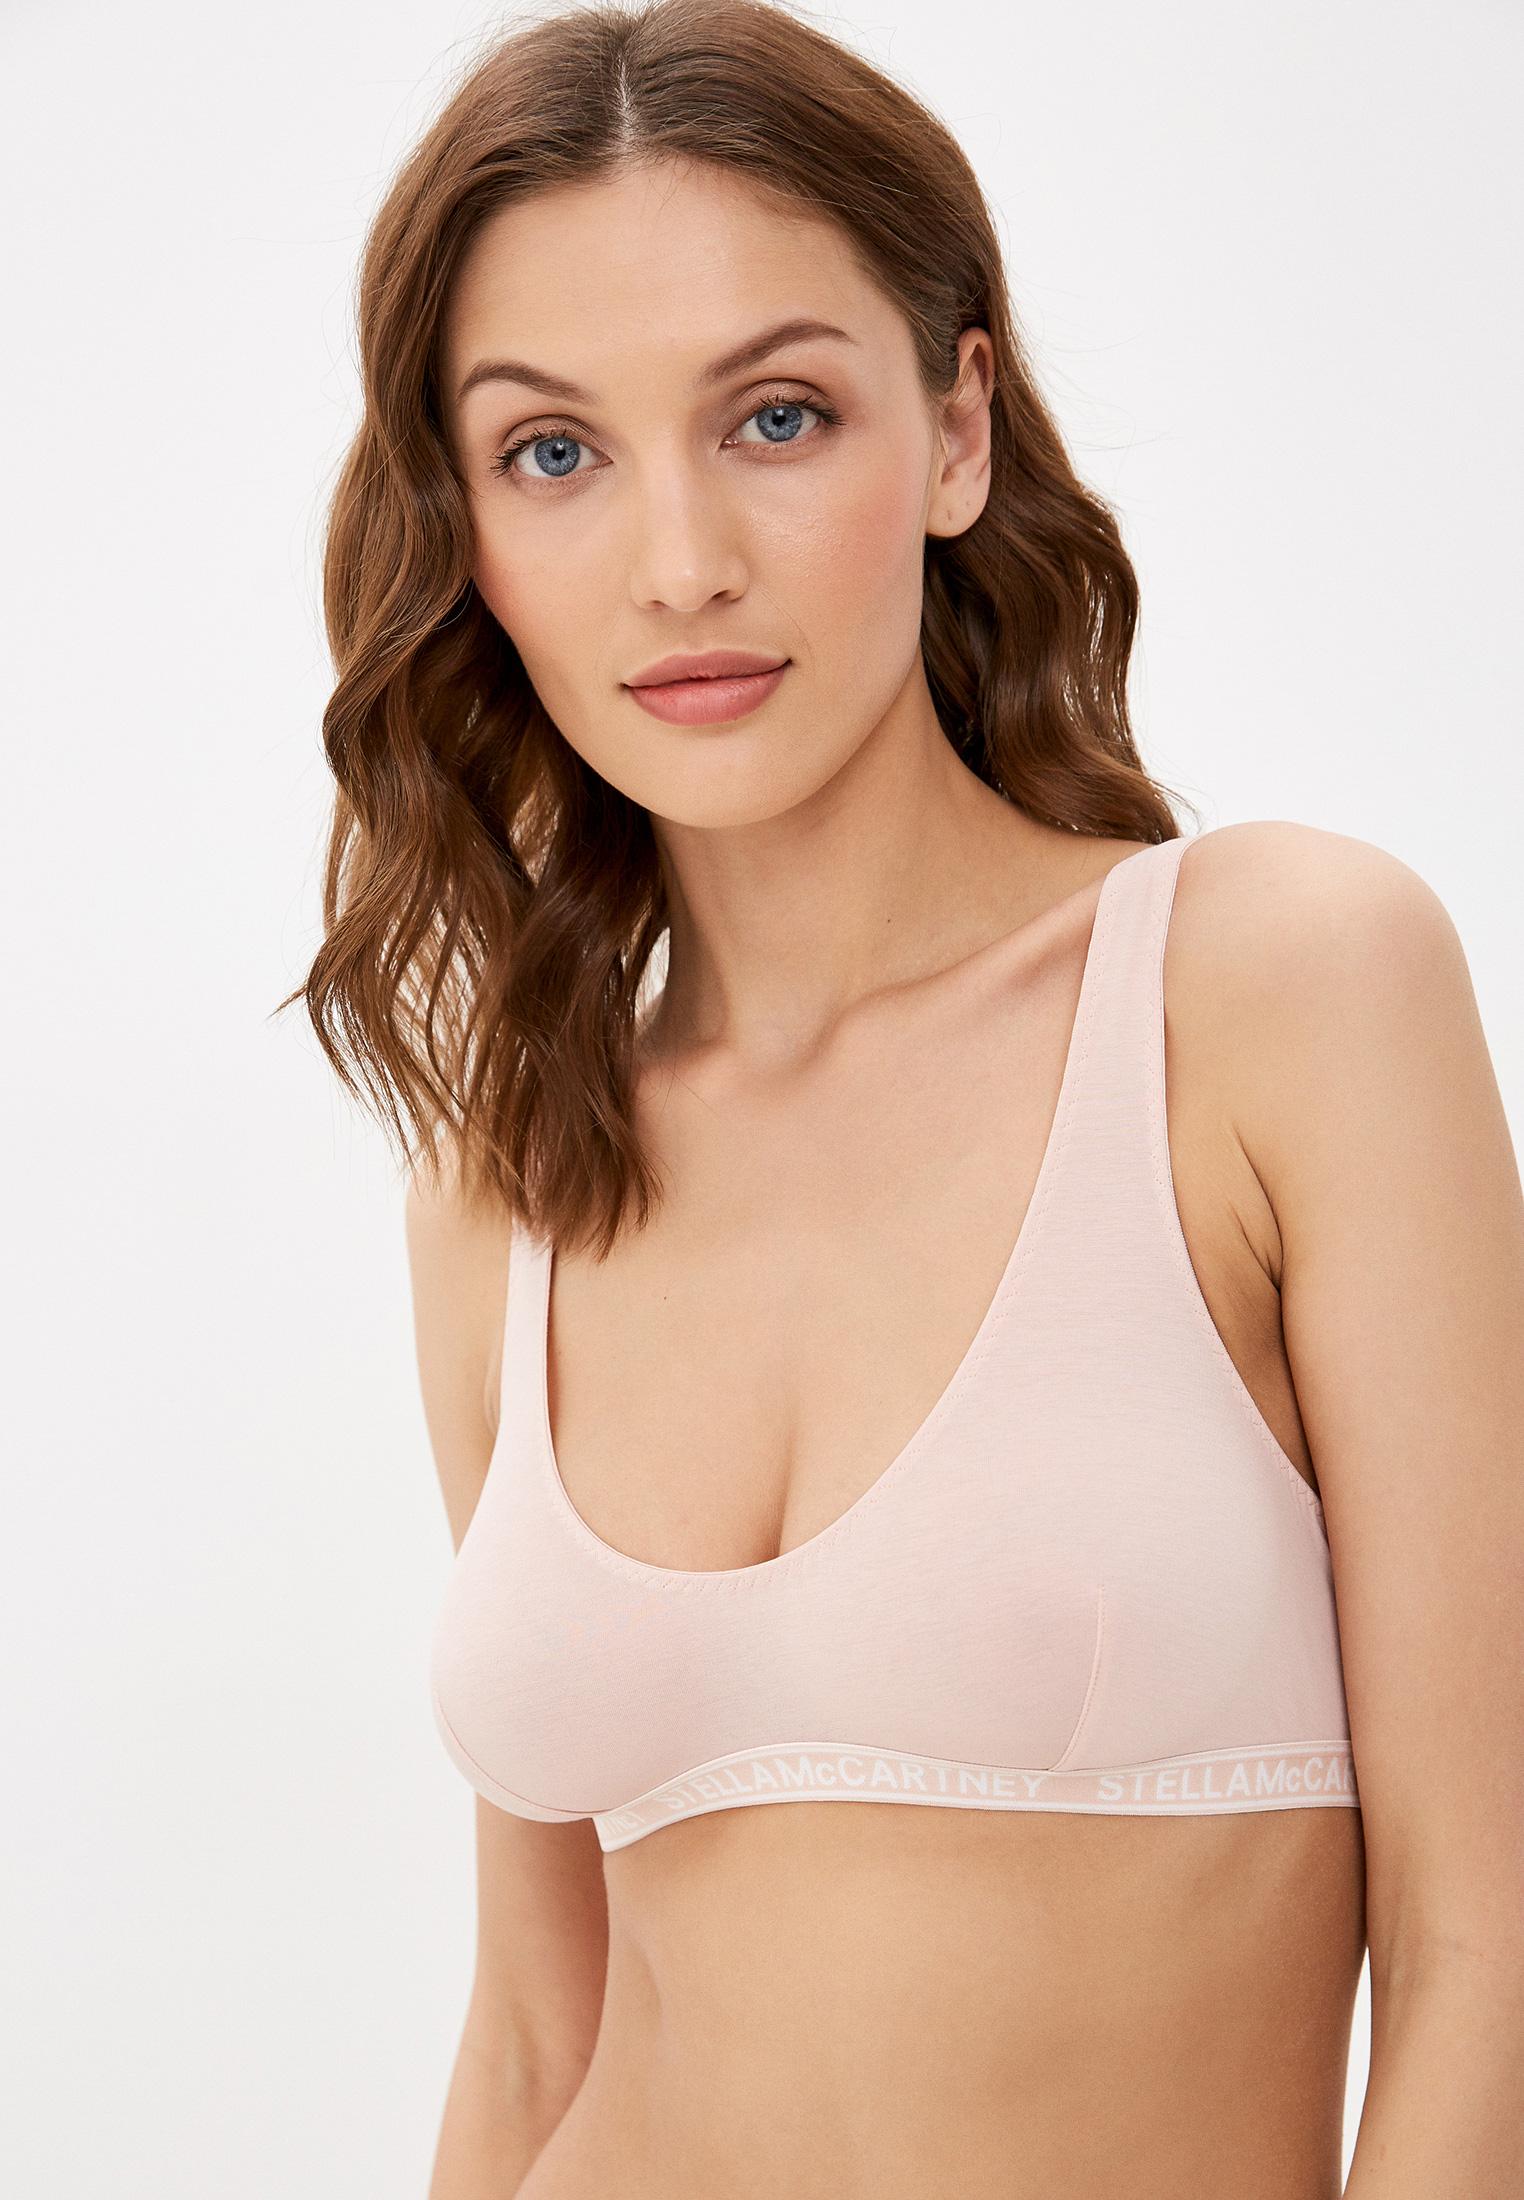 Бюстгальтер Stella McCartney Underwear S6R080780